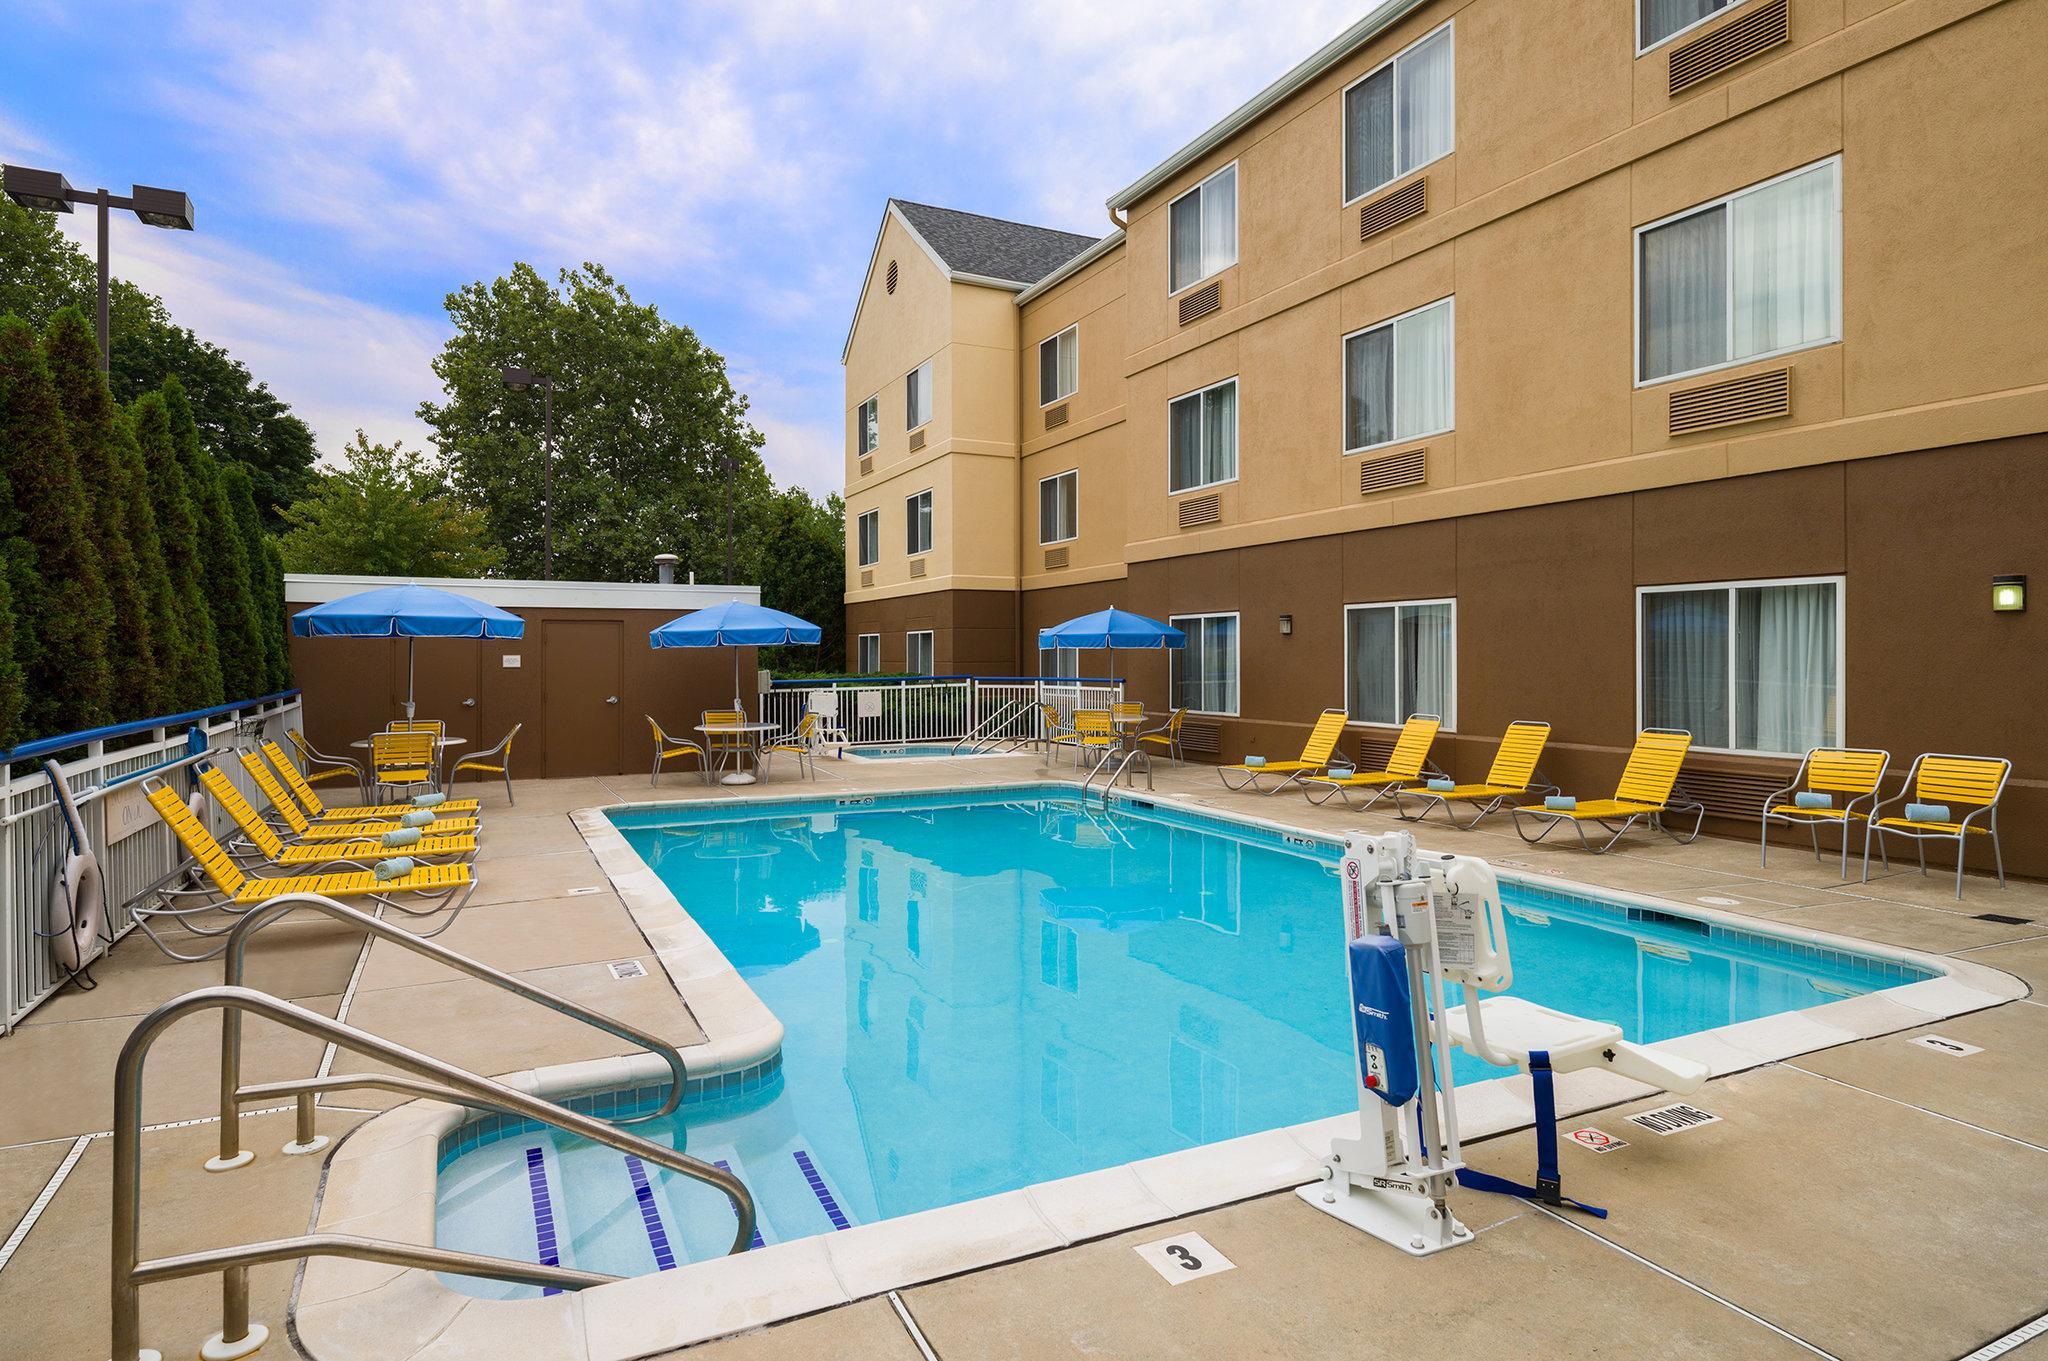 Fairfield Inn & Suites Allentown Bethlehem